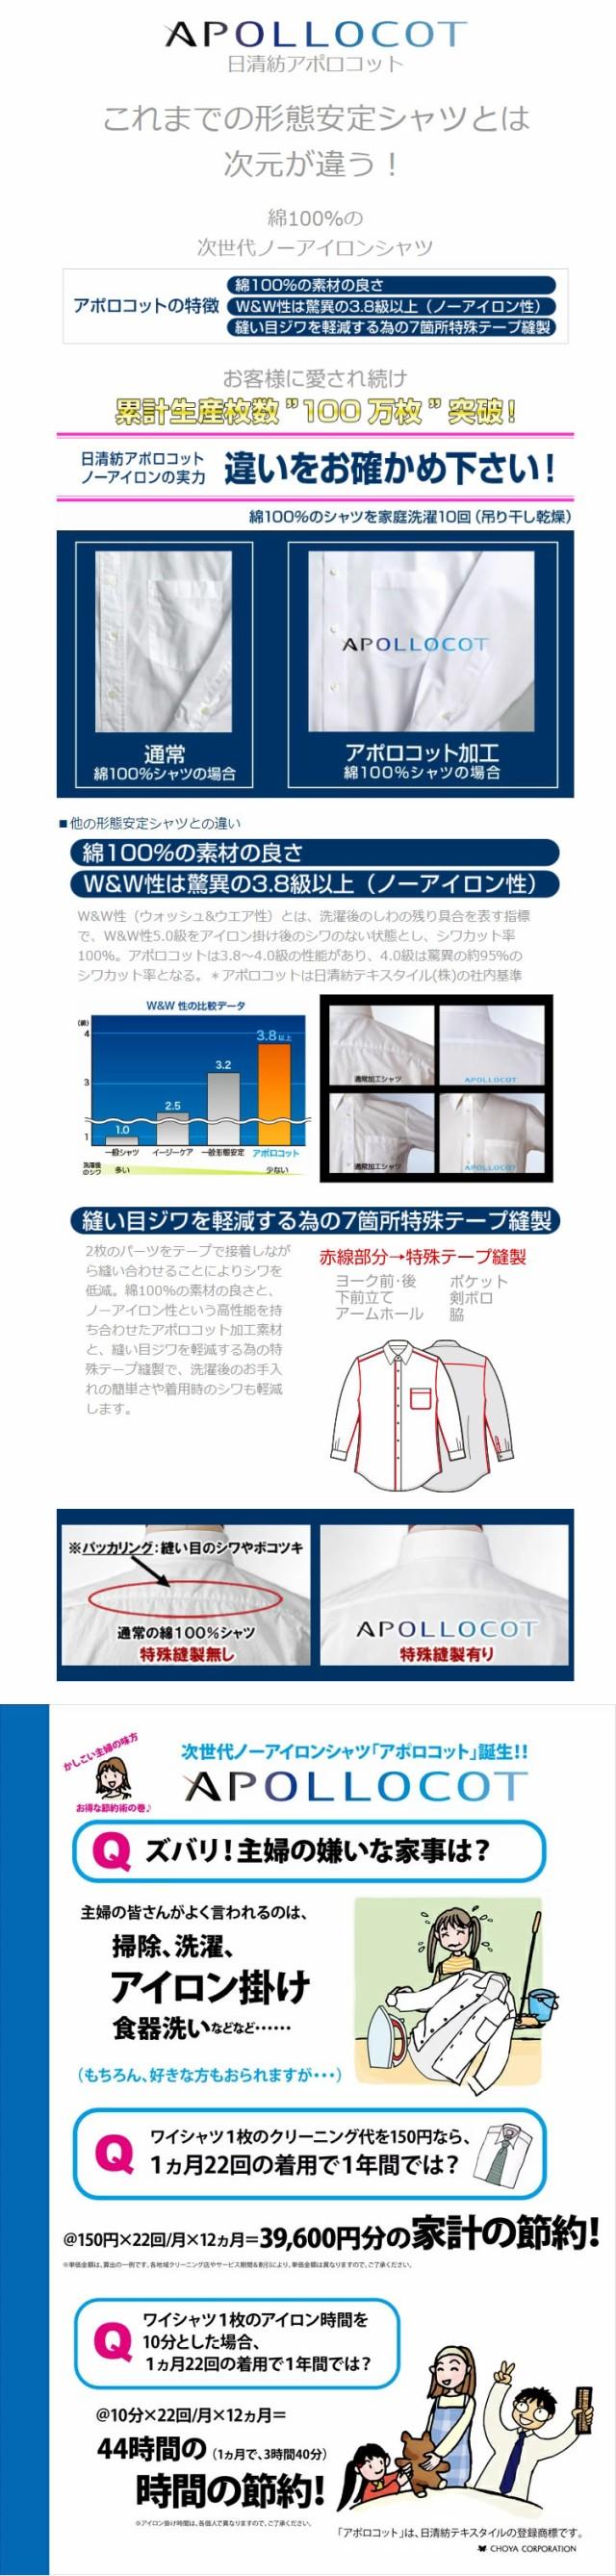 CHOYASHIRT FACTORY(シャツファクトリー)綿100%次世代ノーアイロン『日清紡アポロコット』の説明